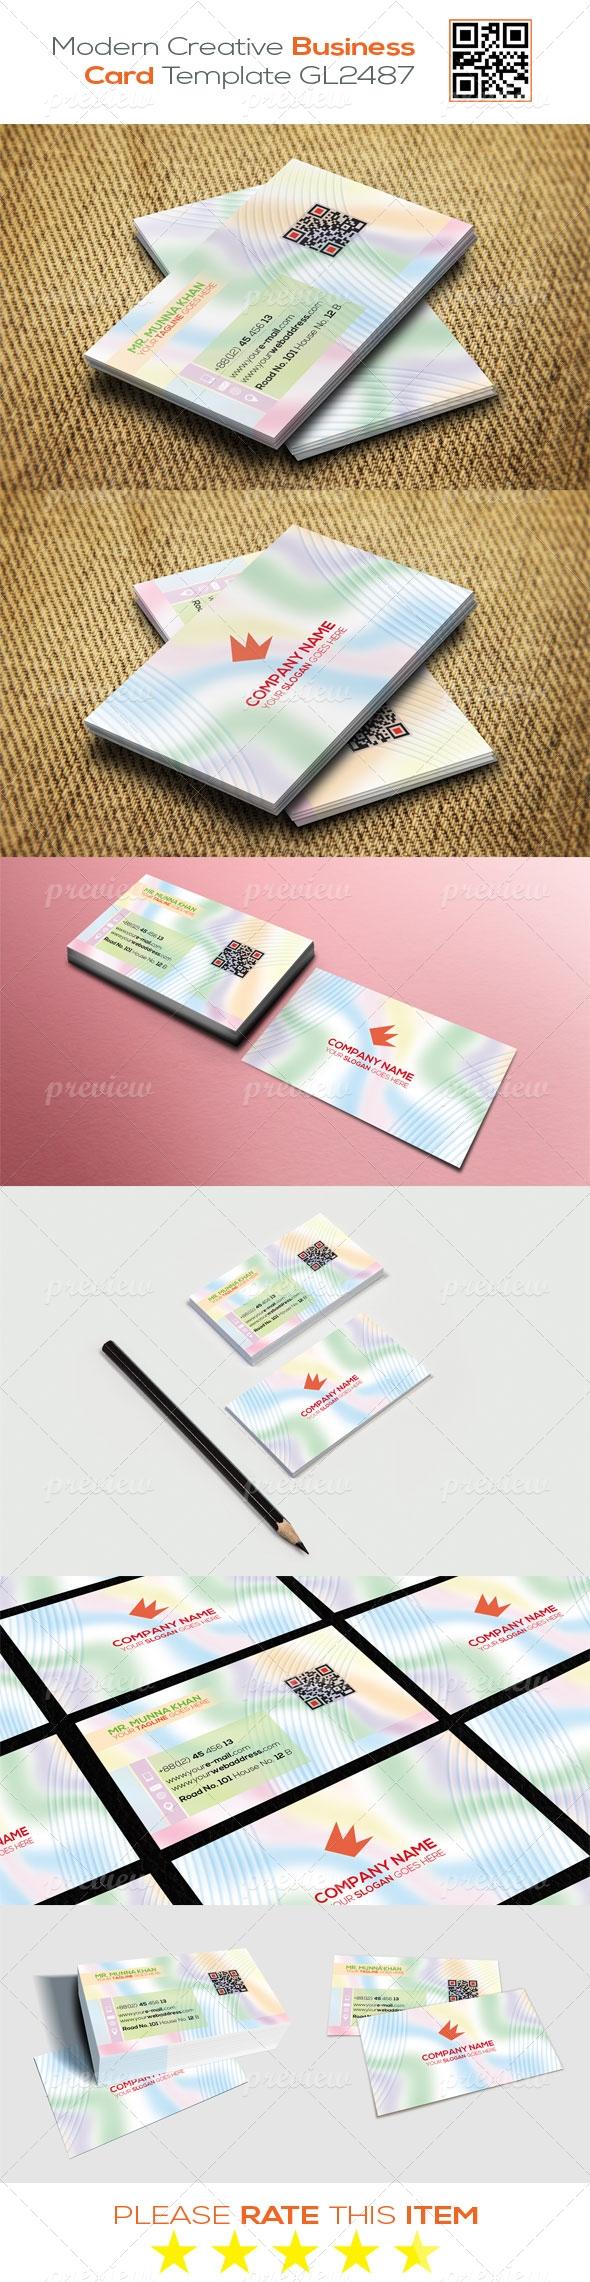 Modern Creative Business Card Template GL2487